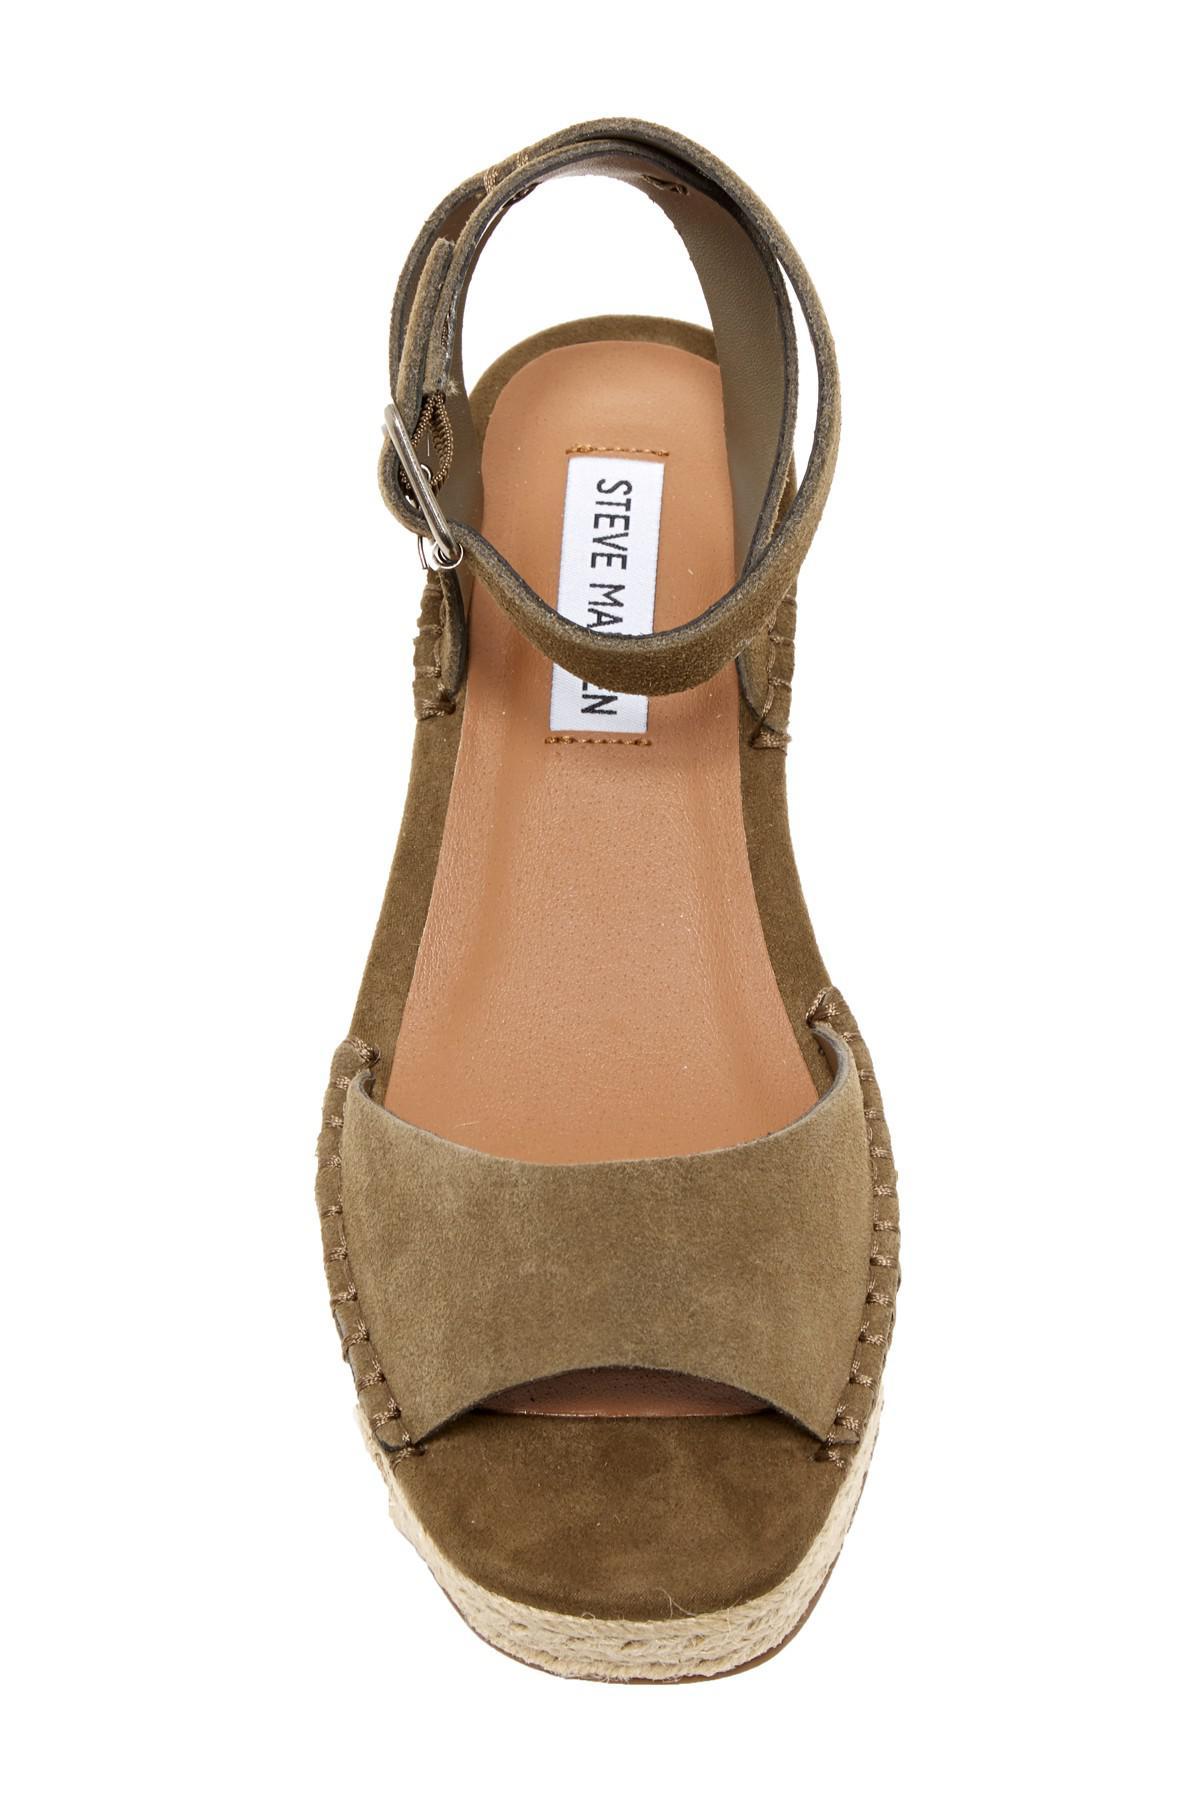 87d95f97385 Lyst - Steve Madden Elody Wedge Platform Sandal